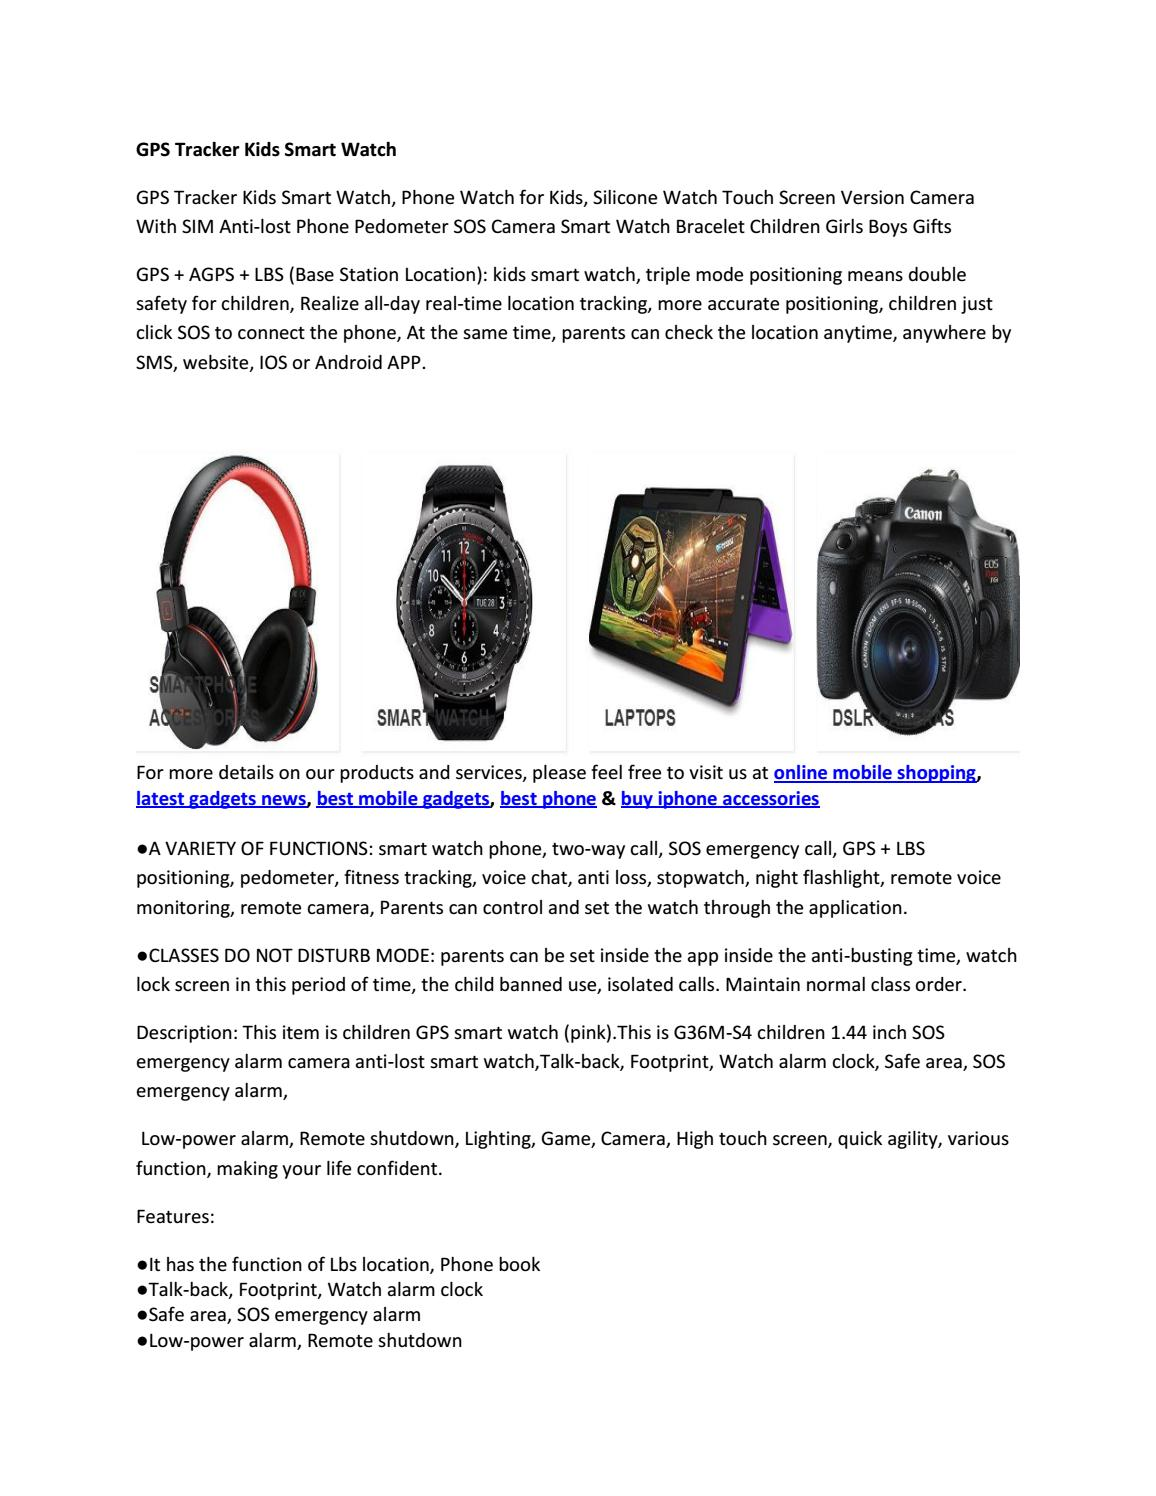 Gps tracker kids smart watch by dreamgadgetspro02 - issuu